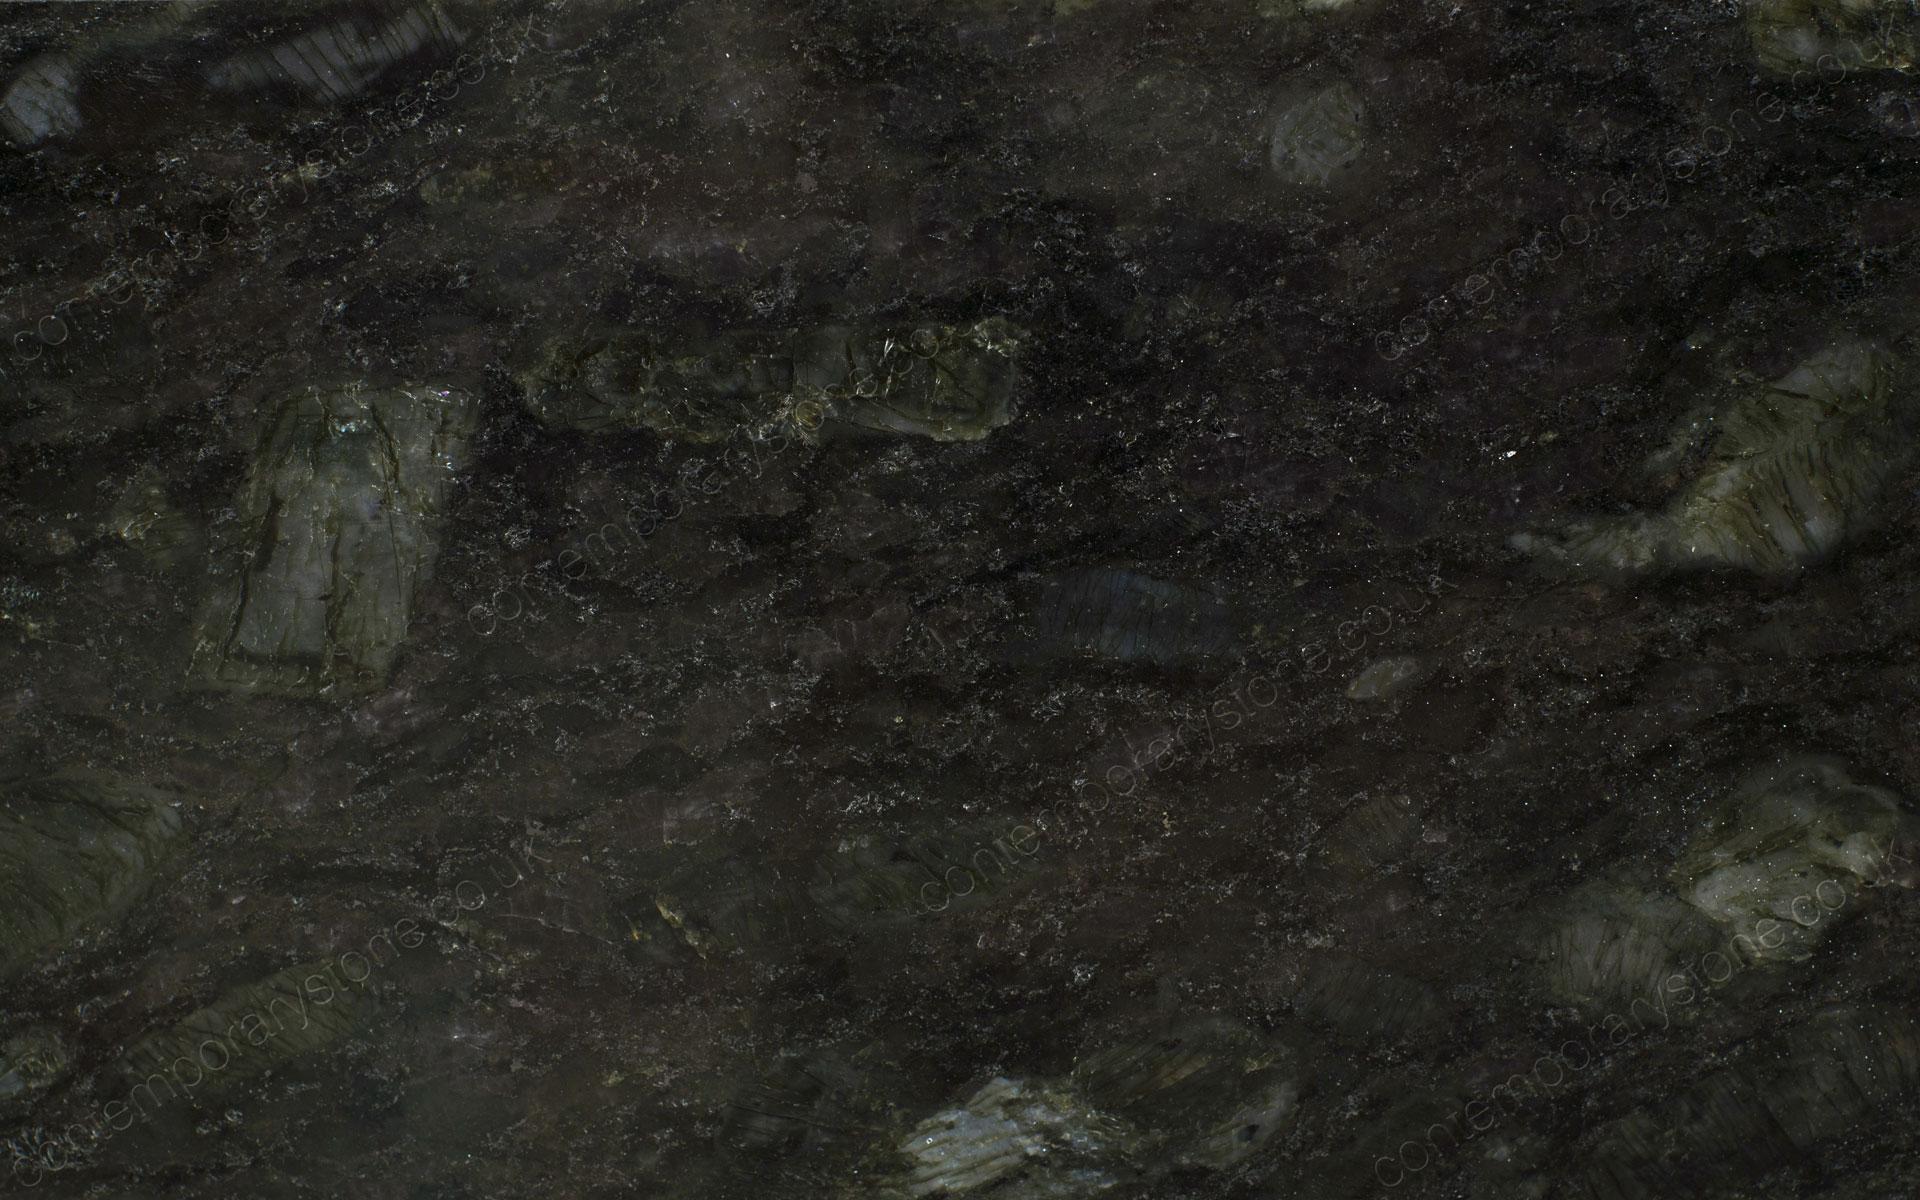 Flash blue granite close-up